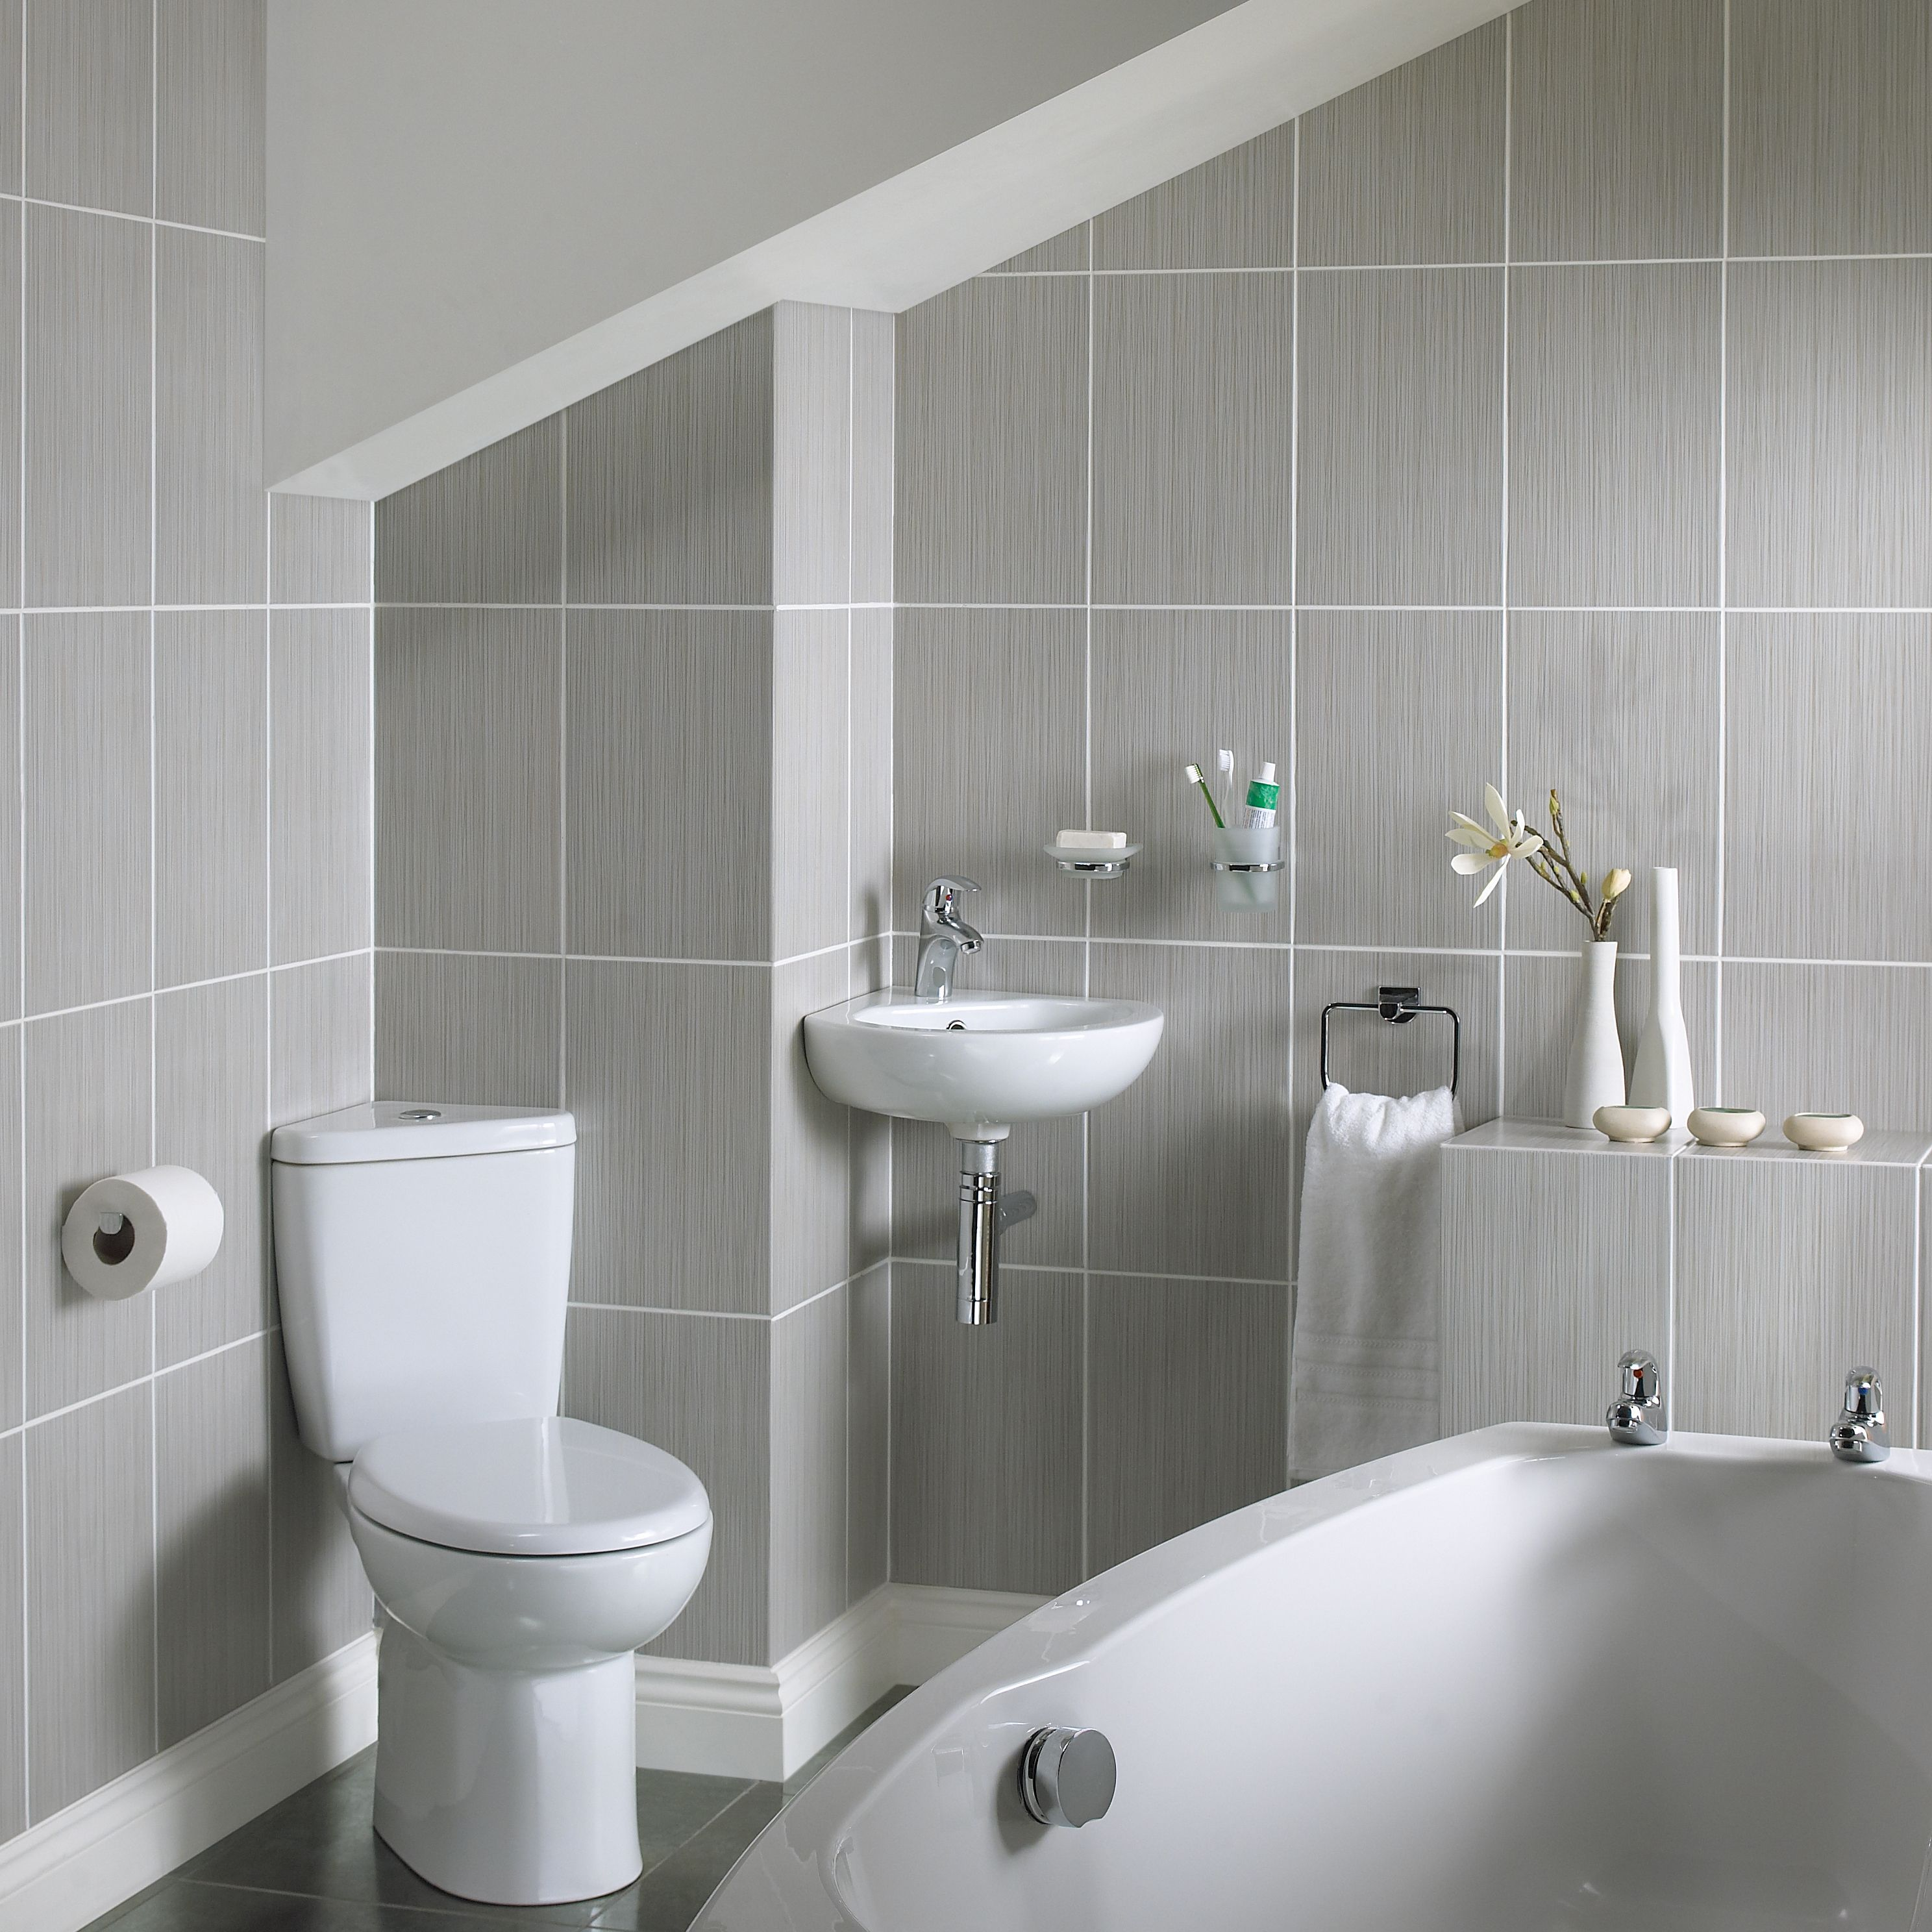 Awkwardly Shaped Bathrooms Ideas Ensuite Ideas Photos Bath Tub In Mosaic Bathroom Ensuite